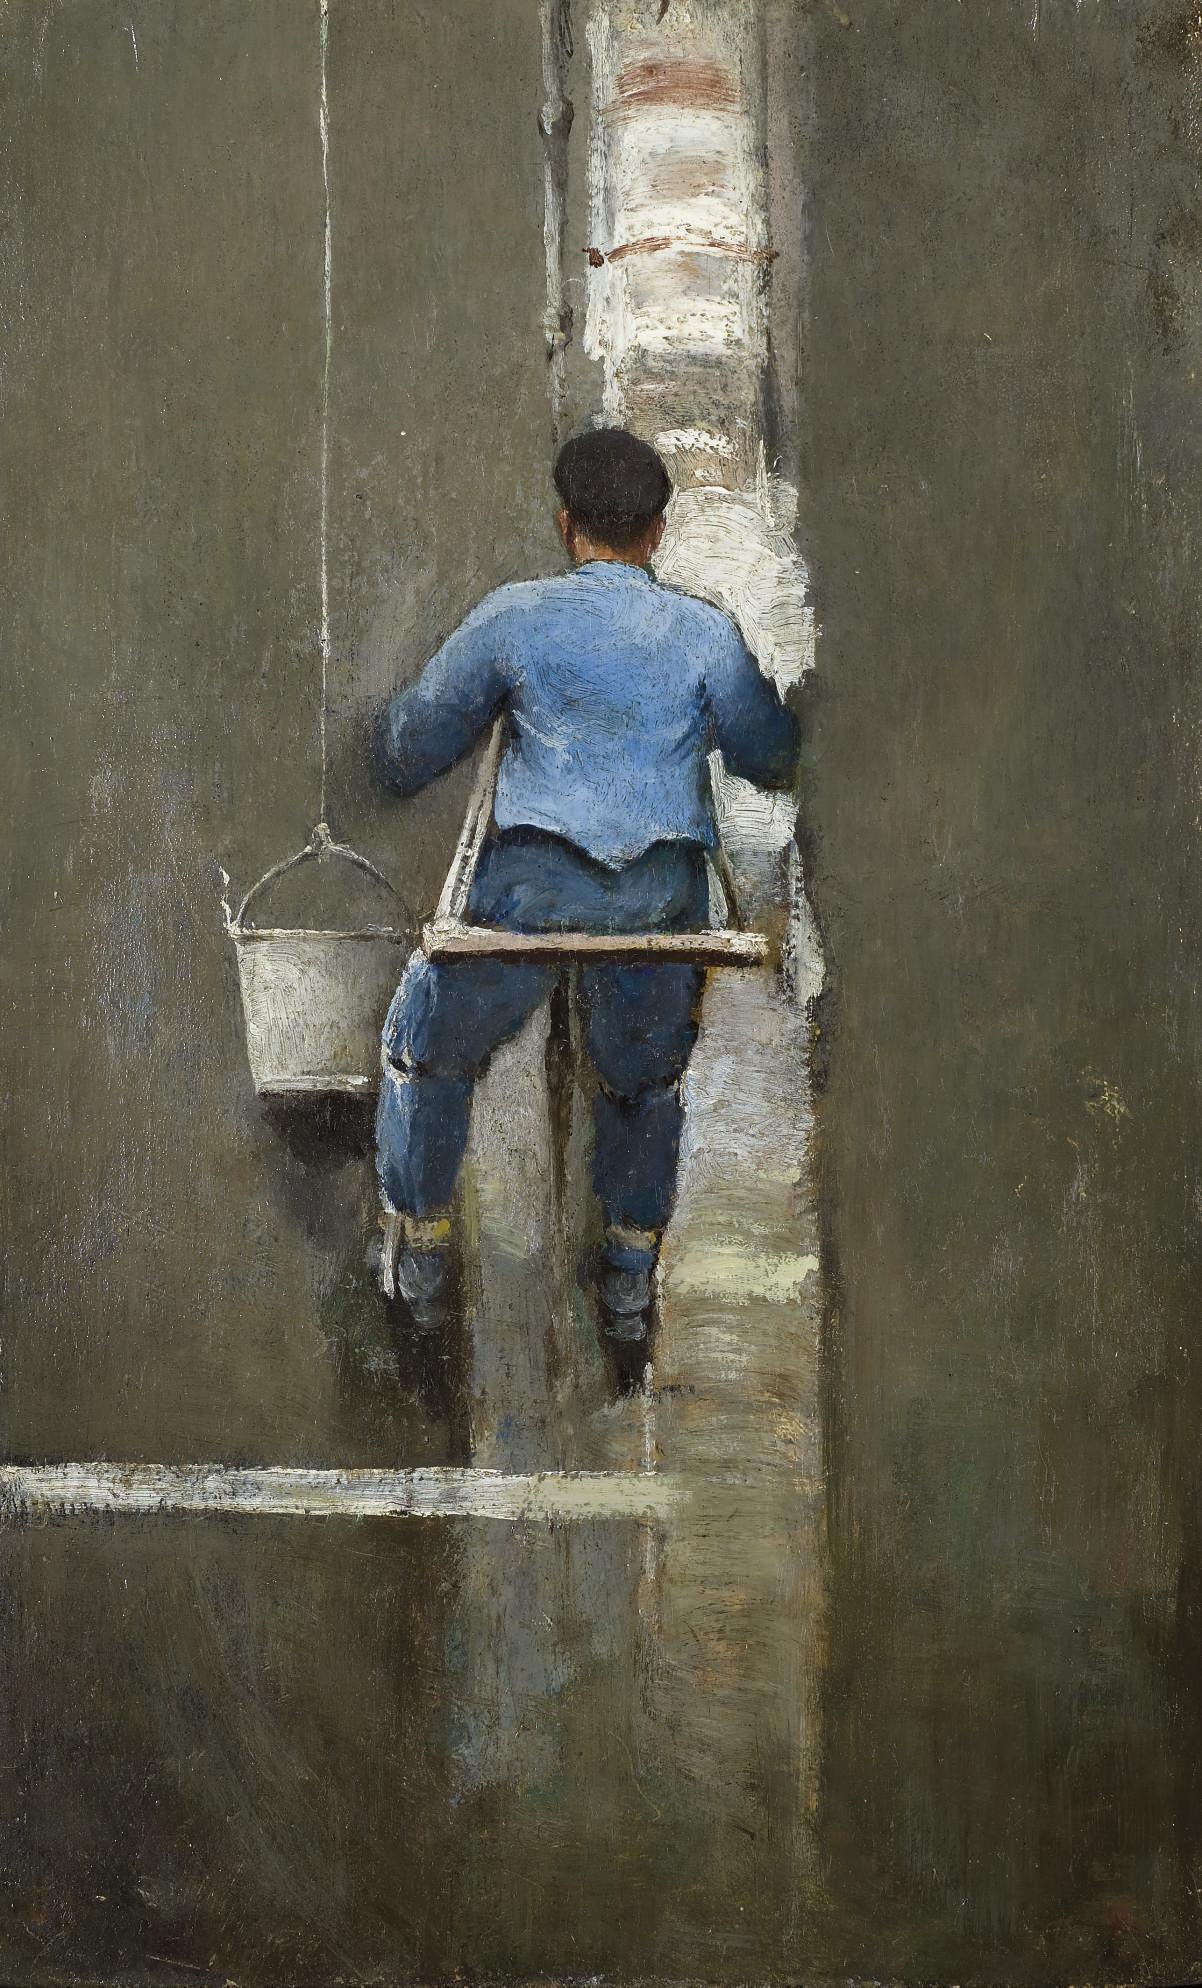 The housepainter